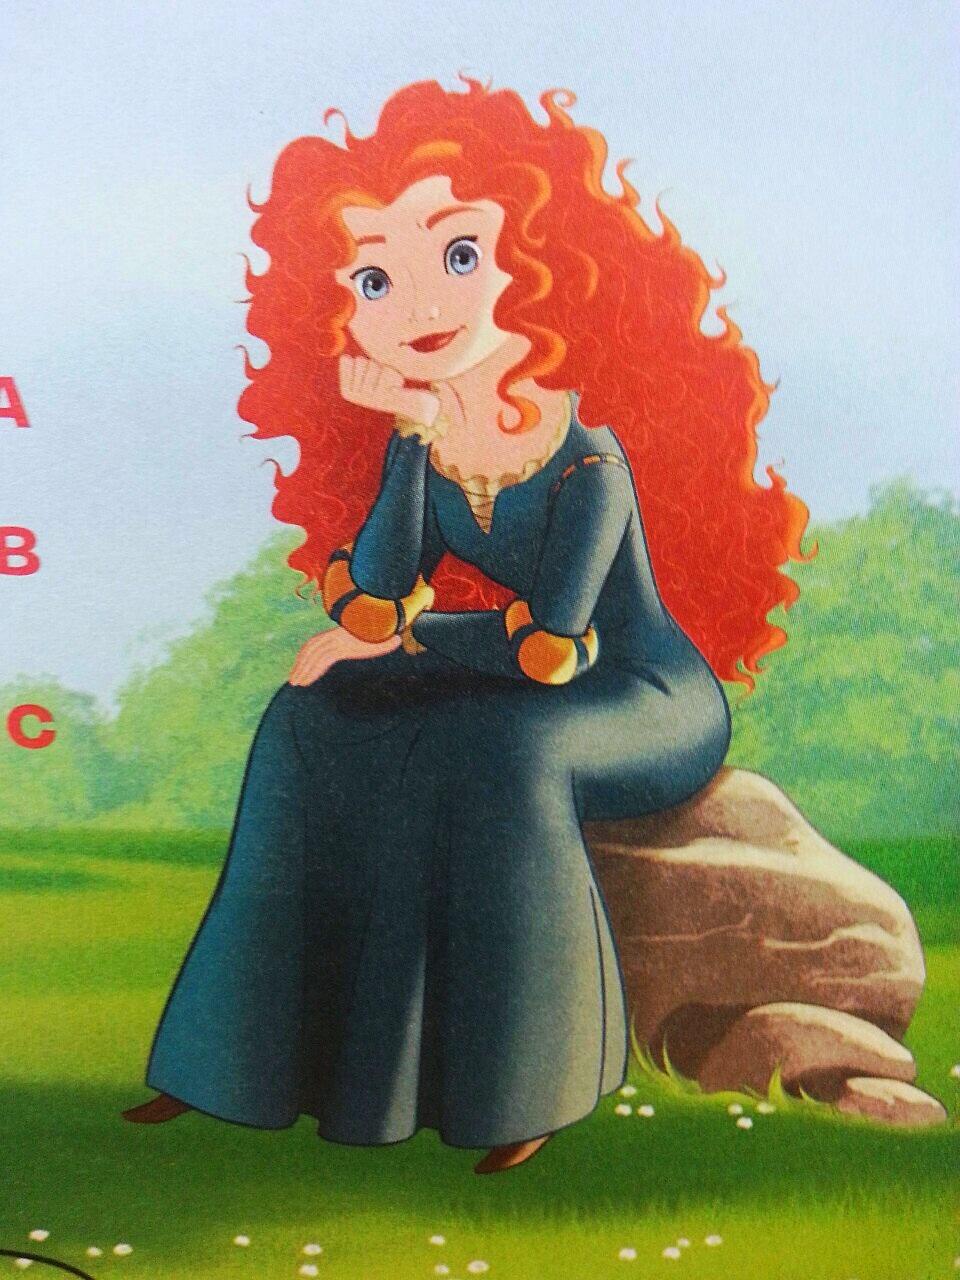 Princess merida disney princess photo 36796642 fanpop - Images princesse ...